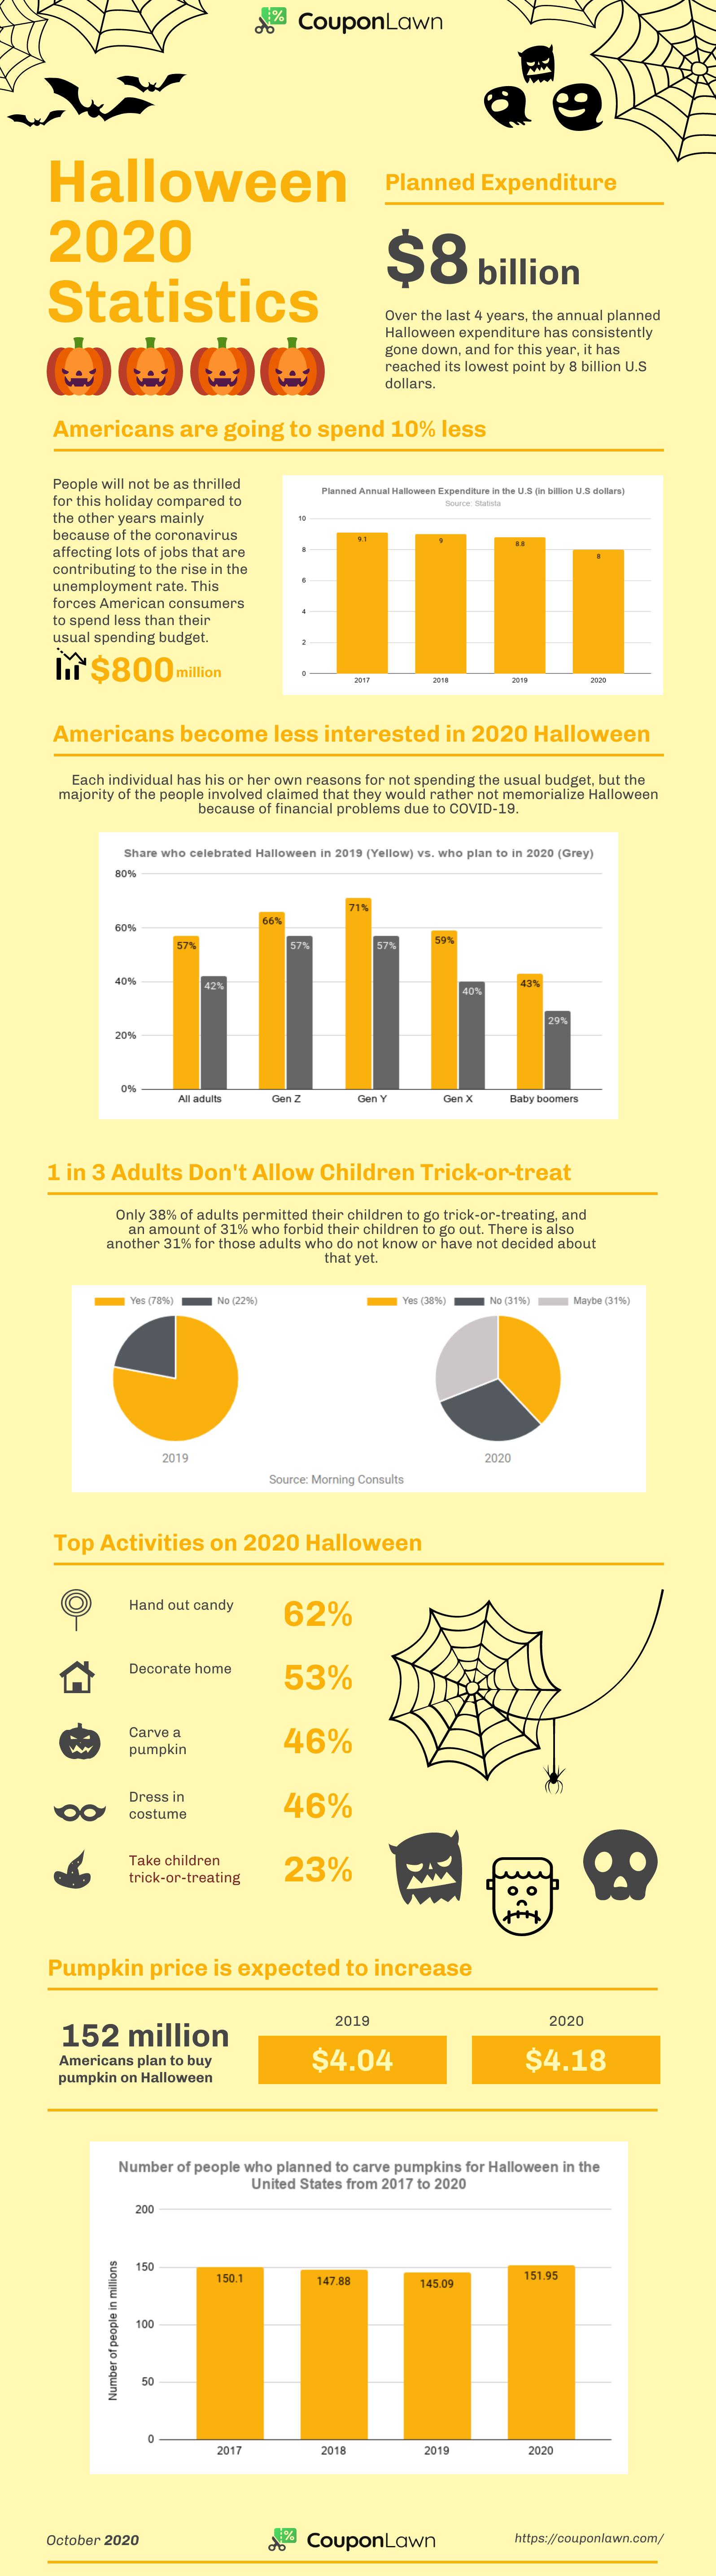 Halloween 2020 Statistics